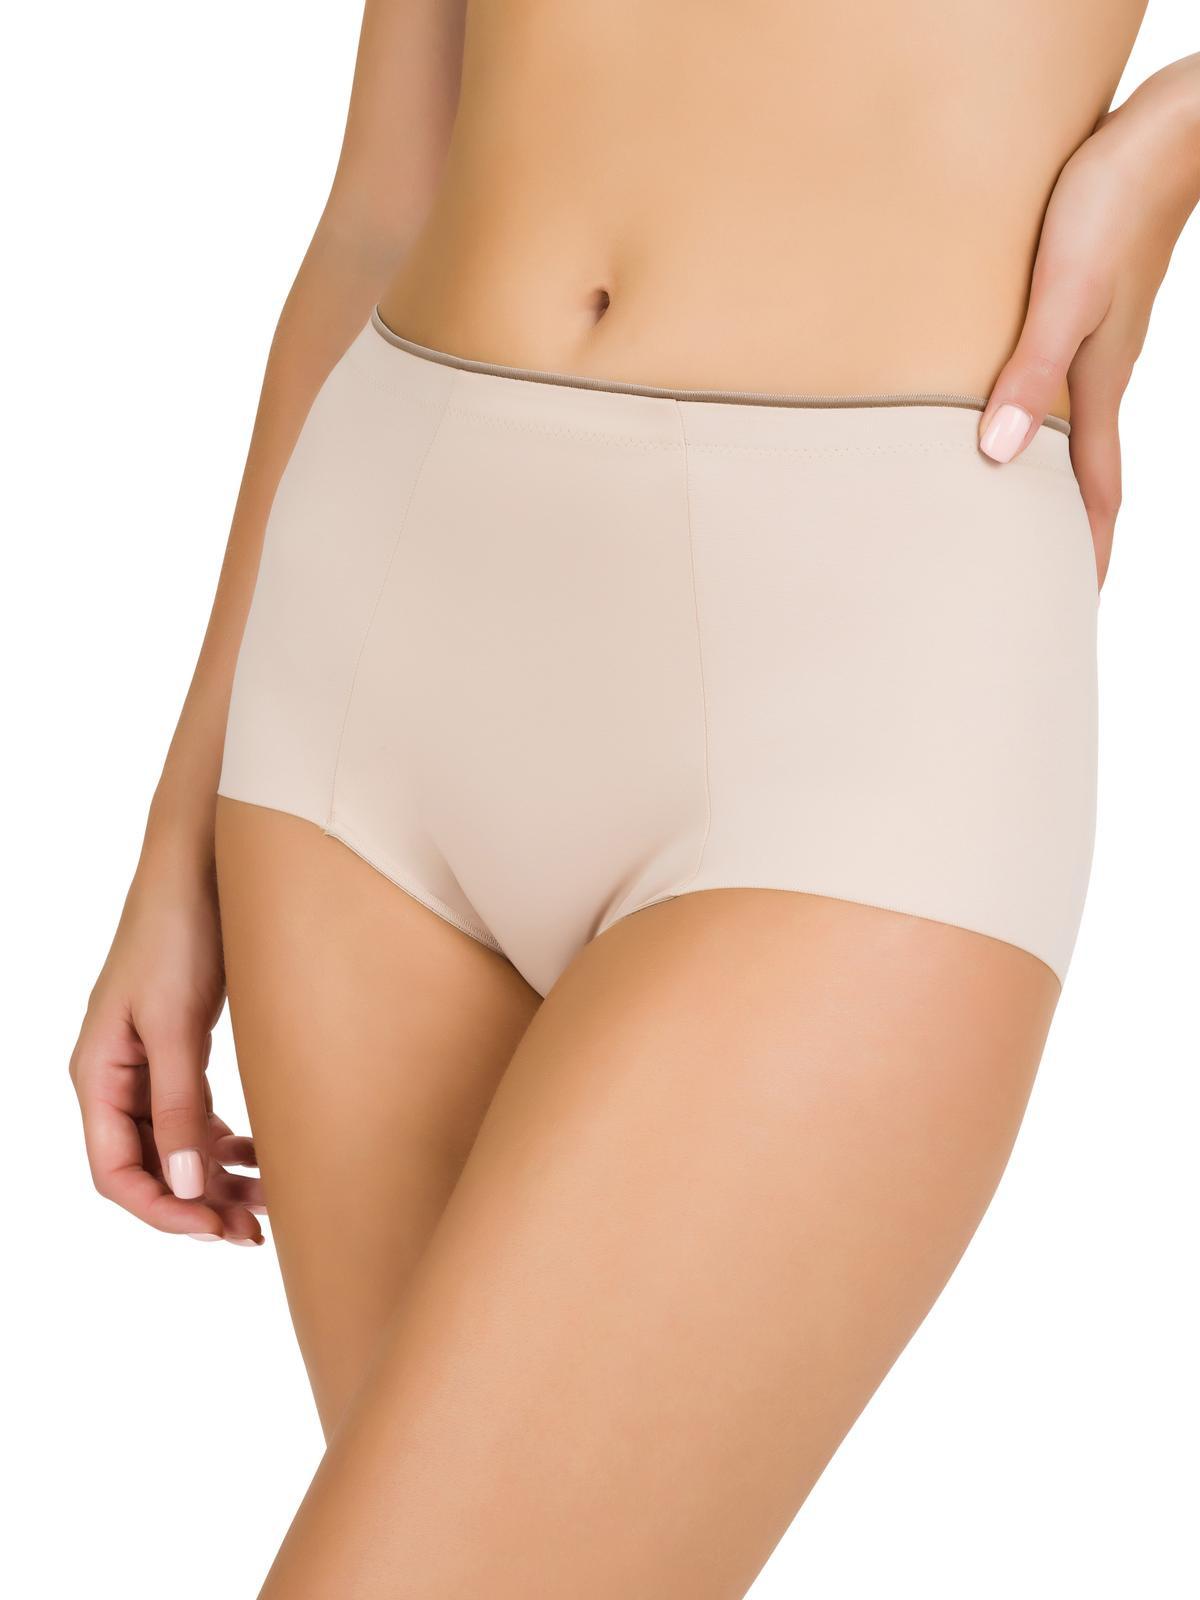 Conturelle Soft Touch kalhotky Miederslip písková 48